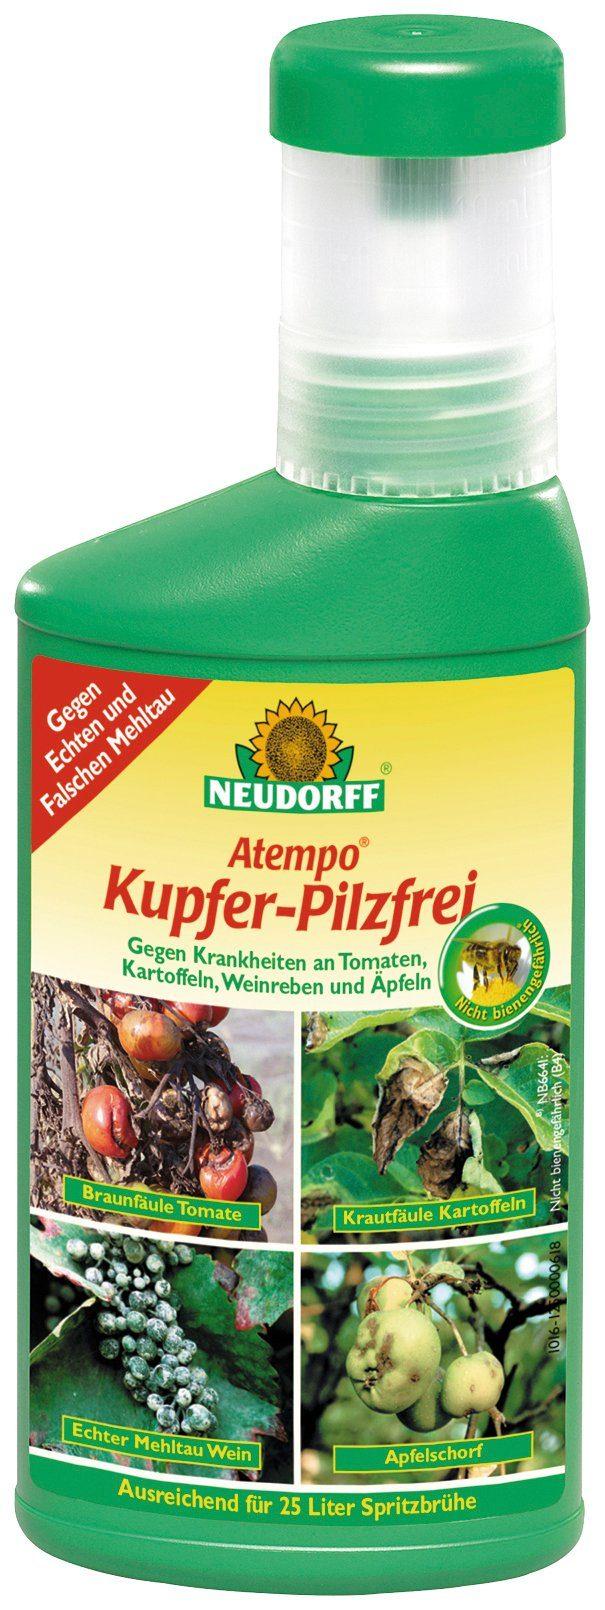 NEUDORFF Pflanzenschutz »Atempo Kupfer-Pilzfrei«